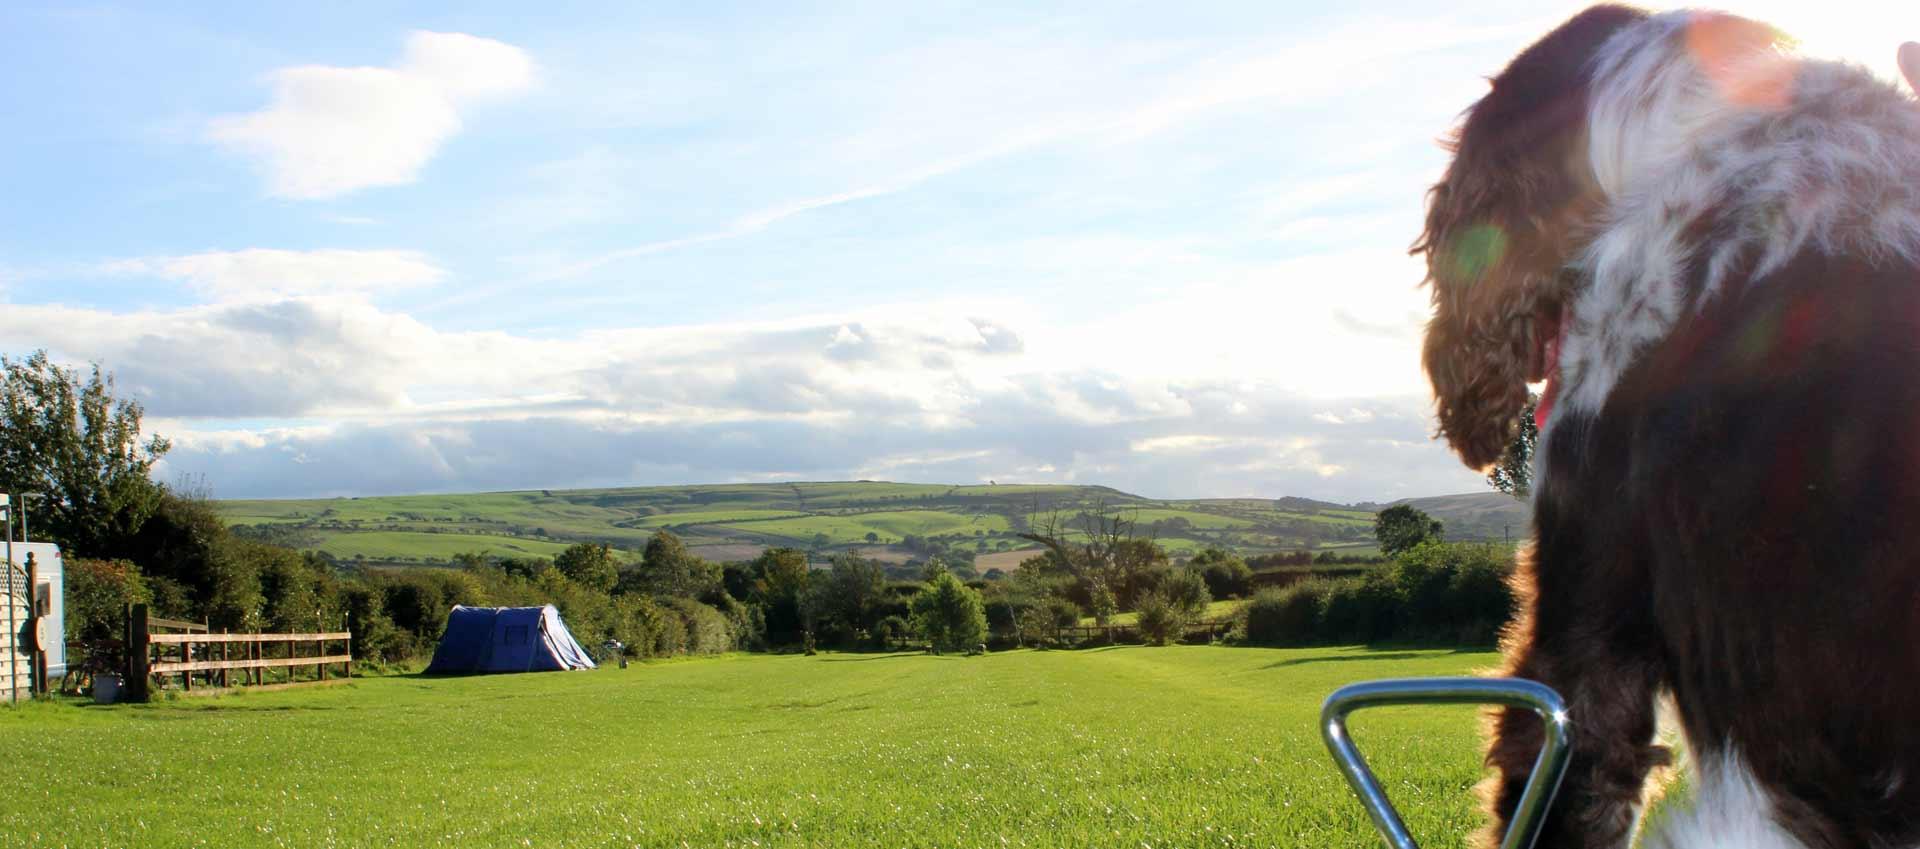 Serenity campsite tent field